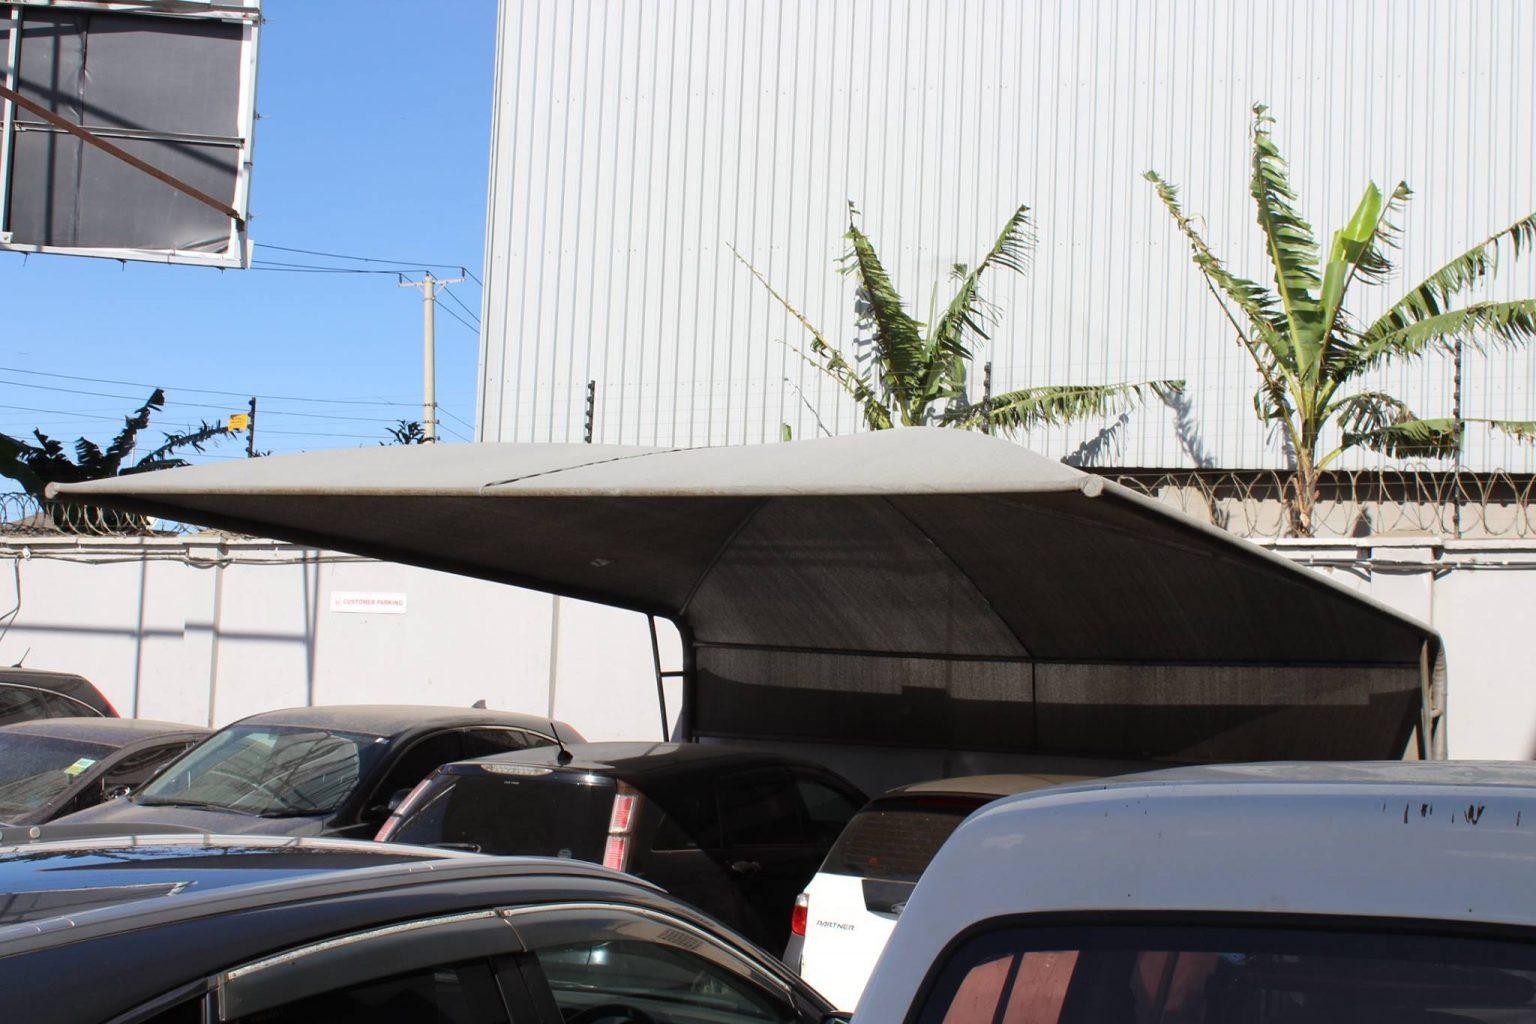 Dome Design Car Parking Shade